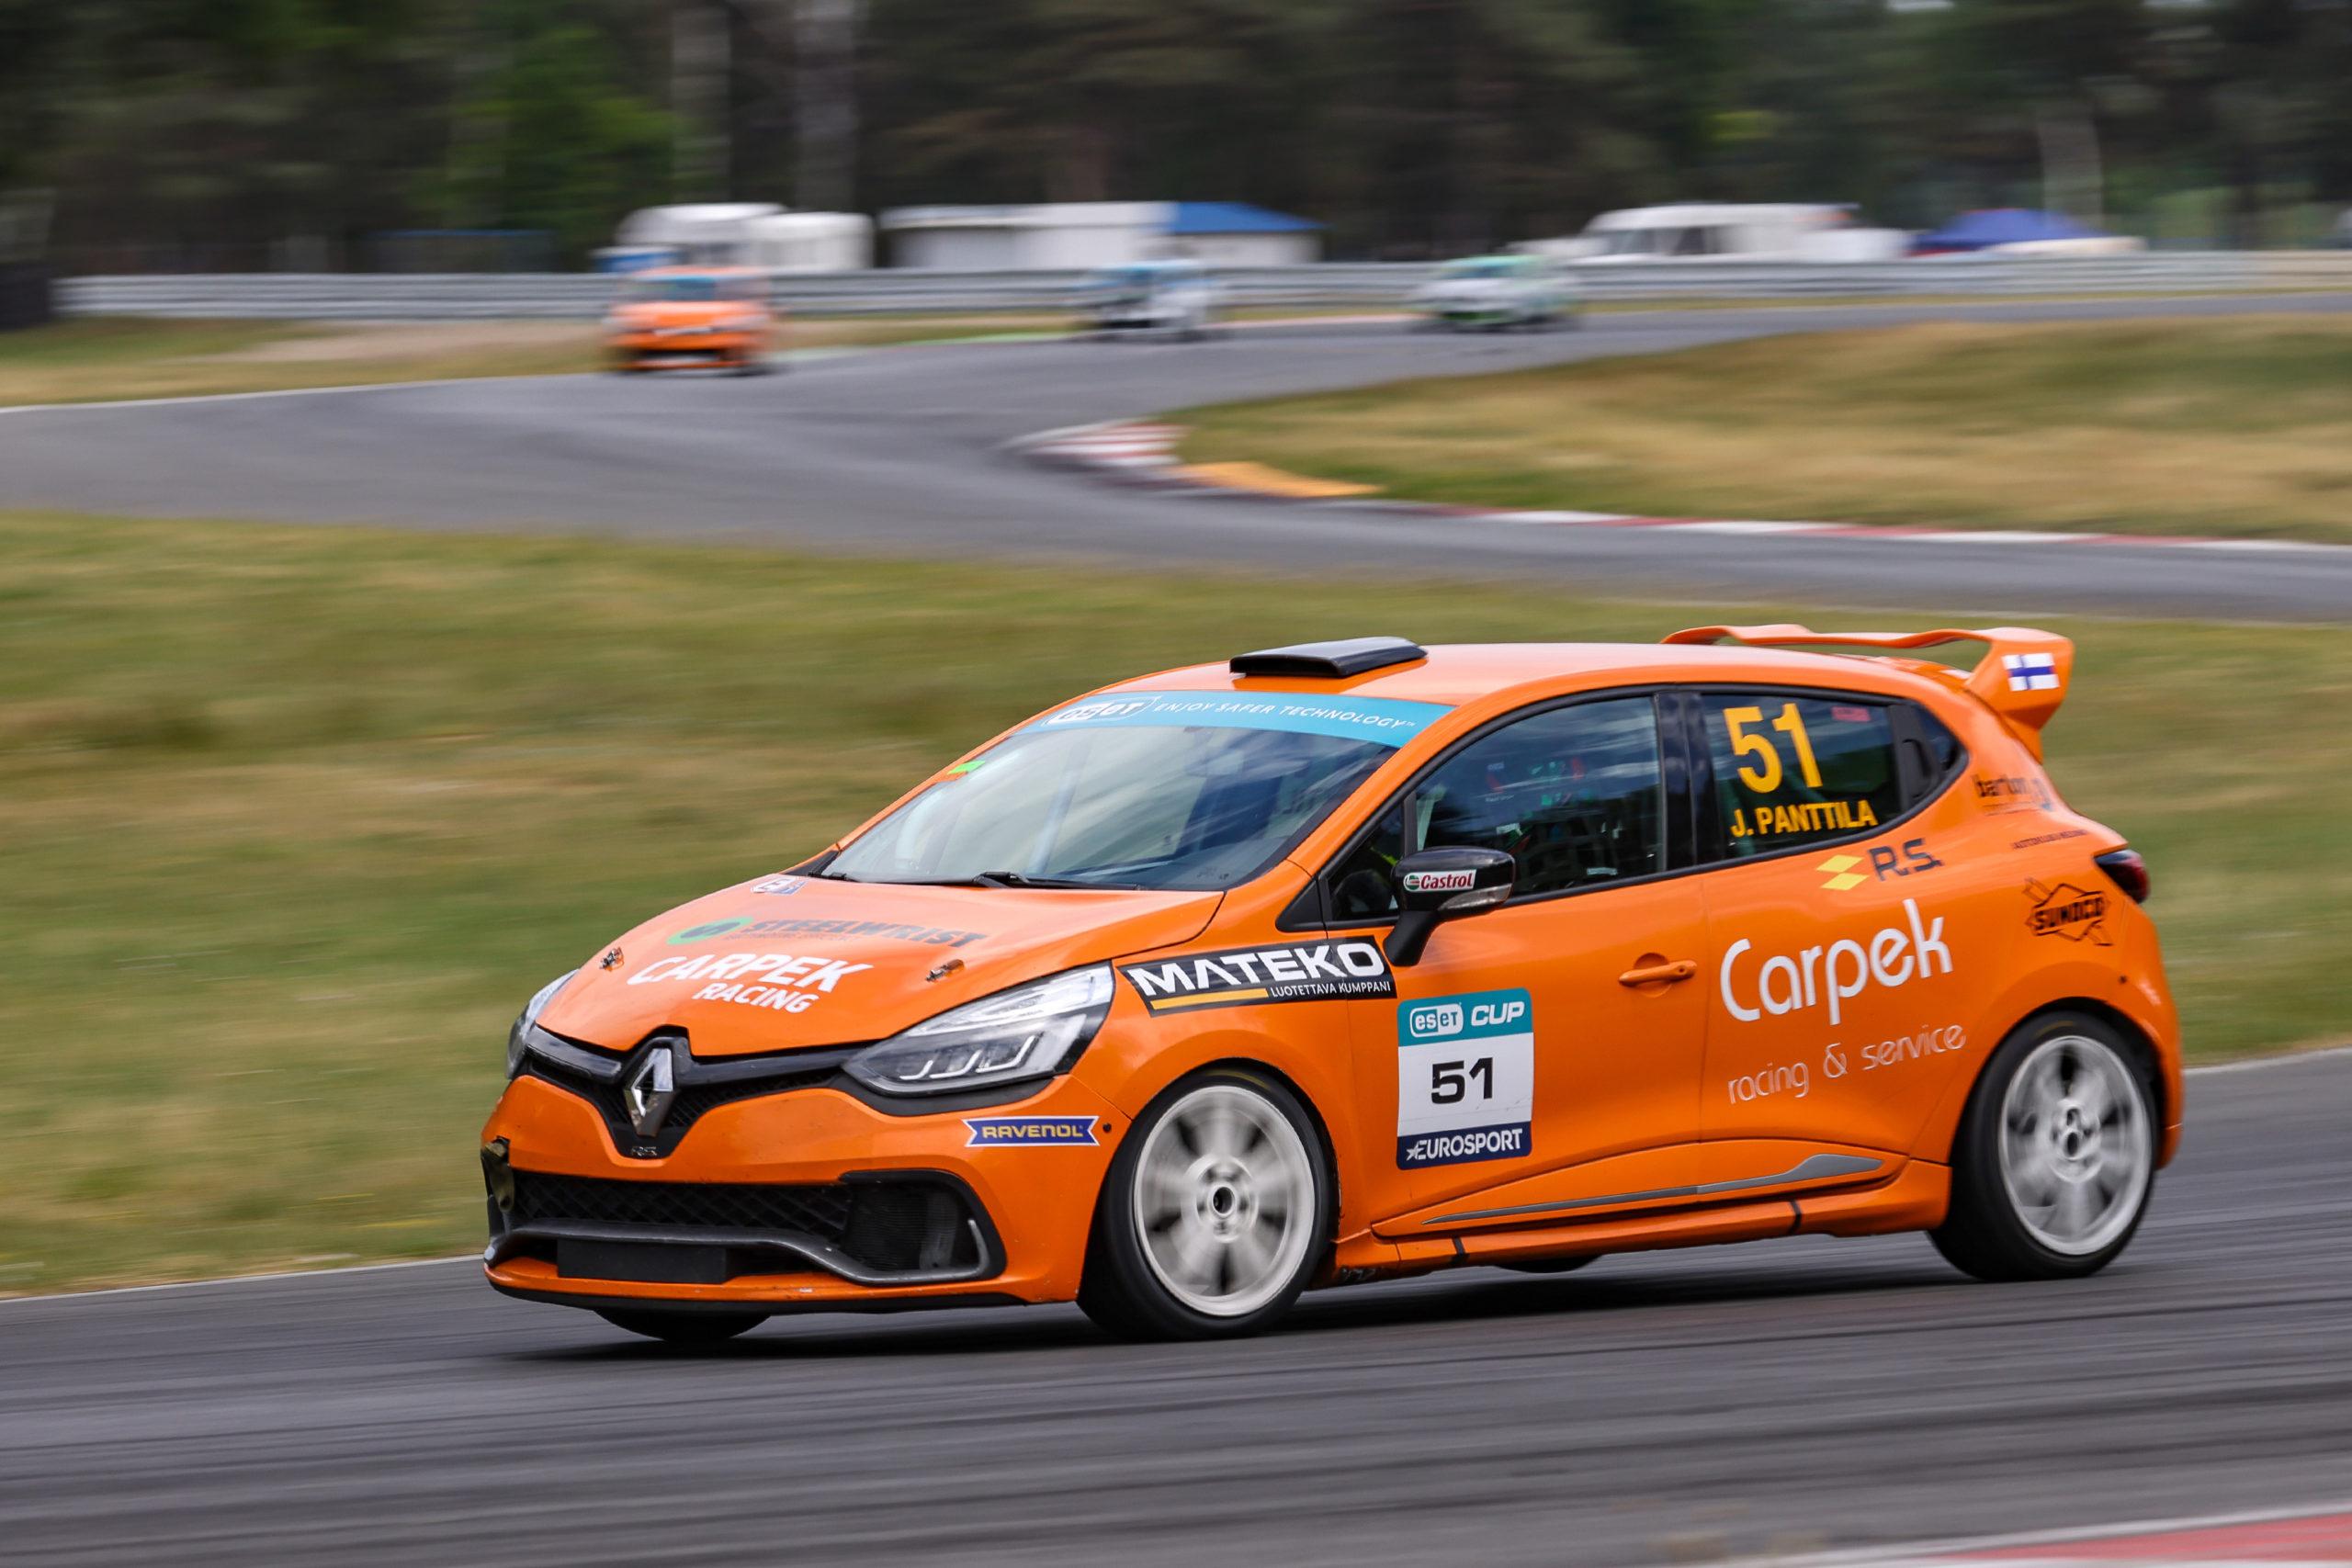 Panttila získal v napínavém závodě Clio Cupu Bohemia premiérový triumf